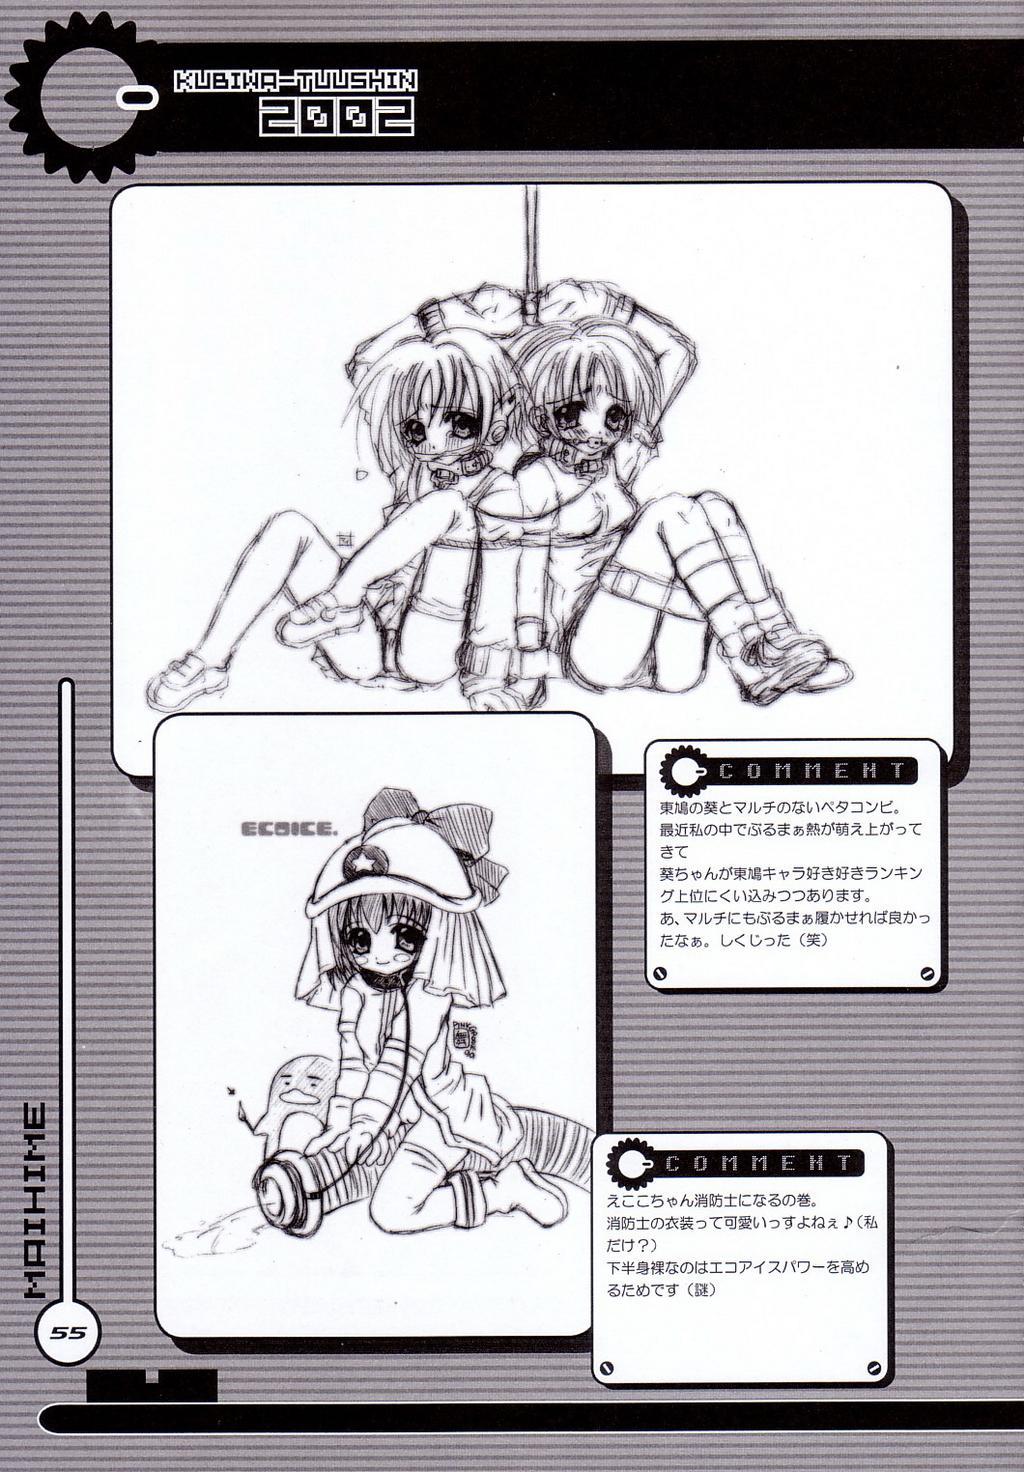 Kubiwa Tsuushin Volume 4 53